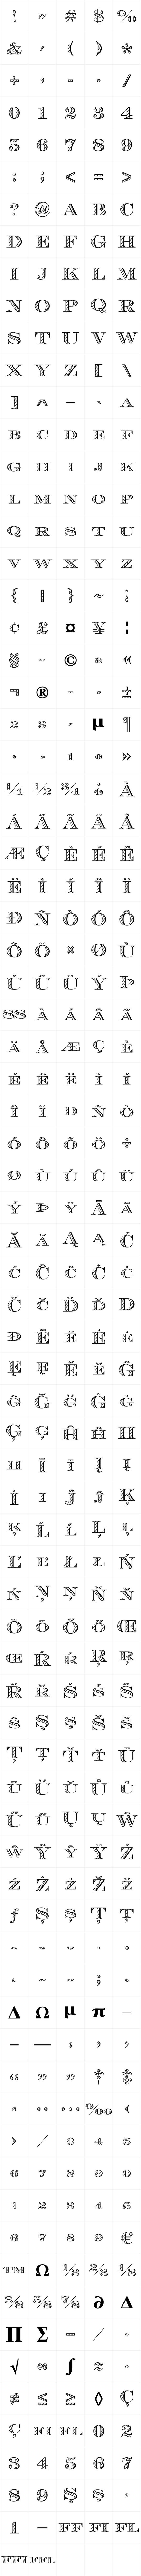 Engravers DT